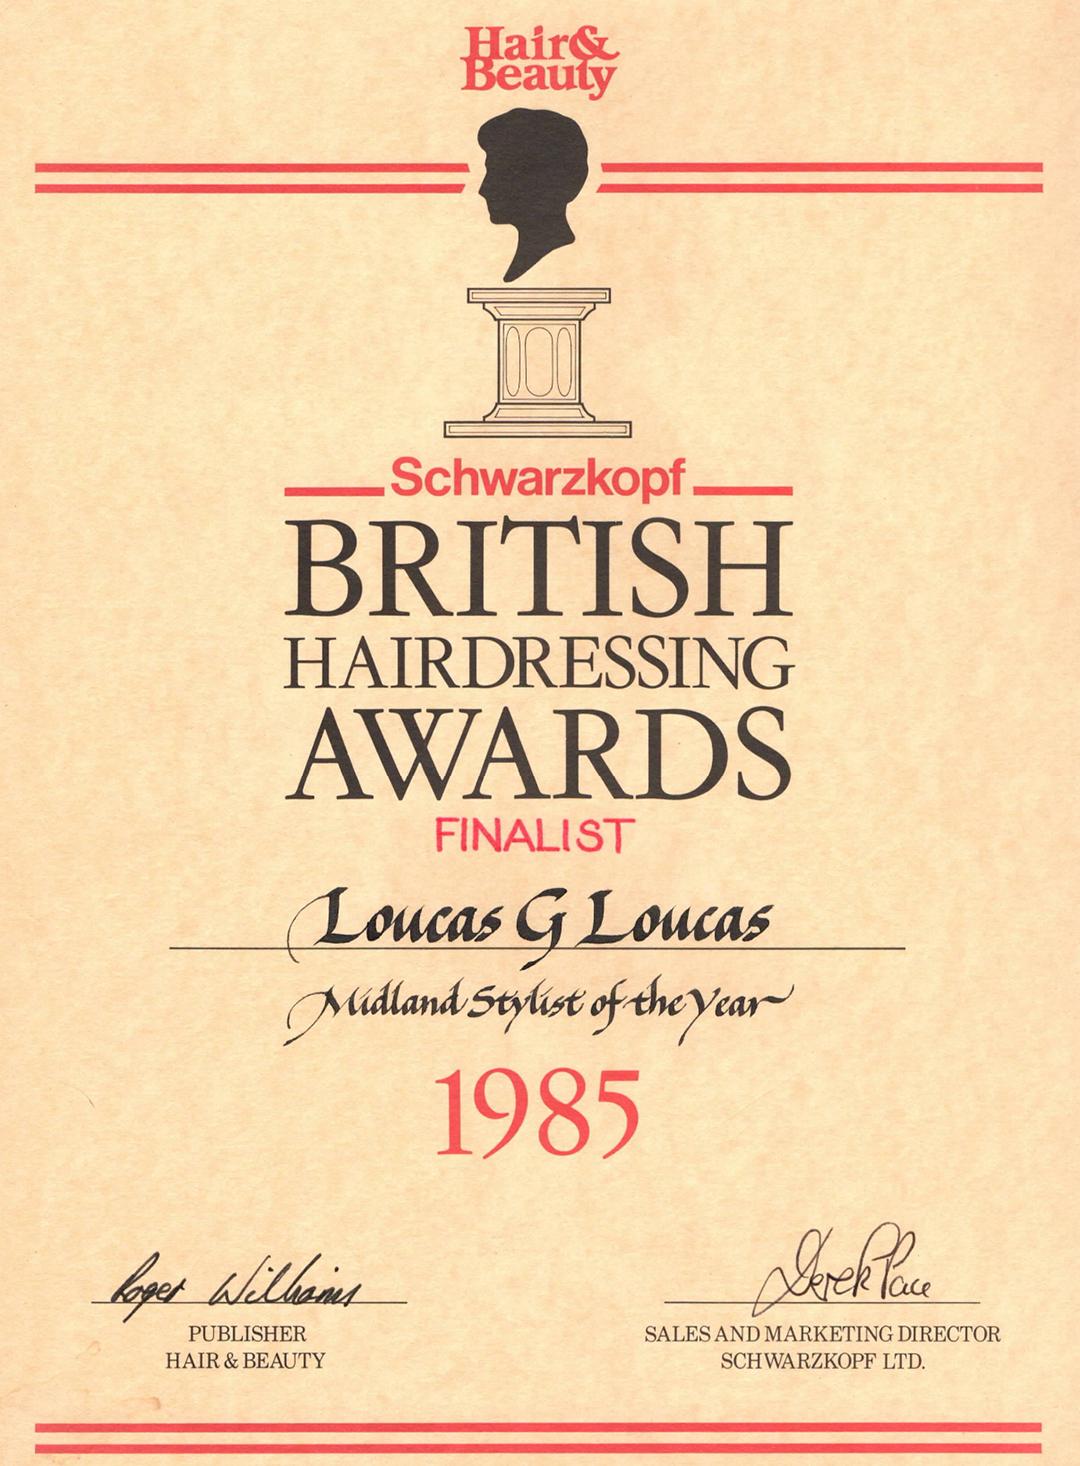 stone hair art - award 1985